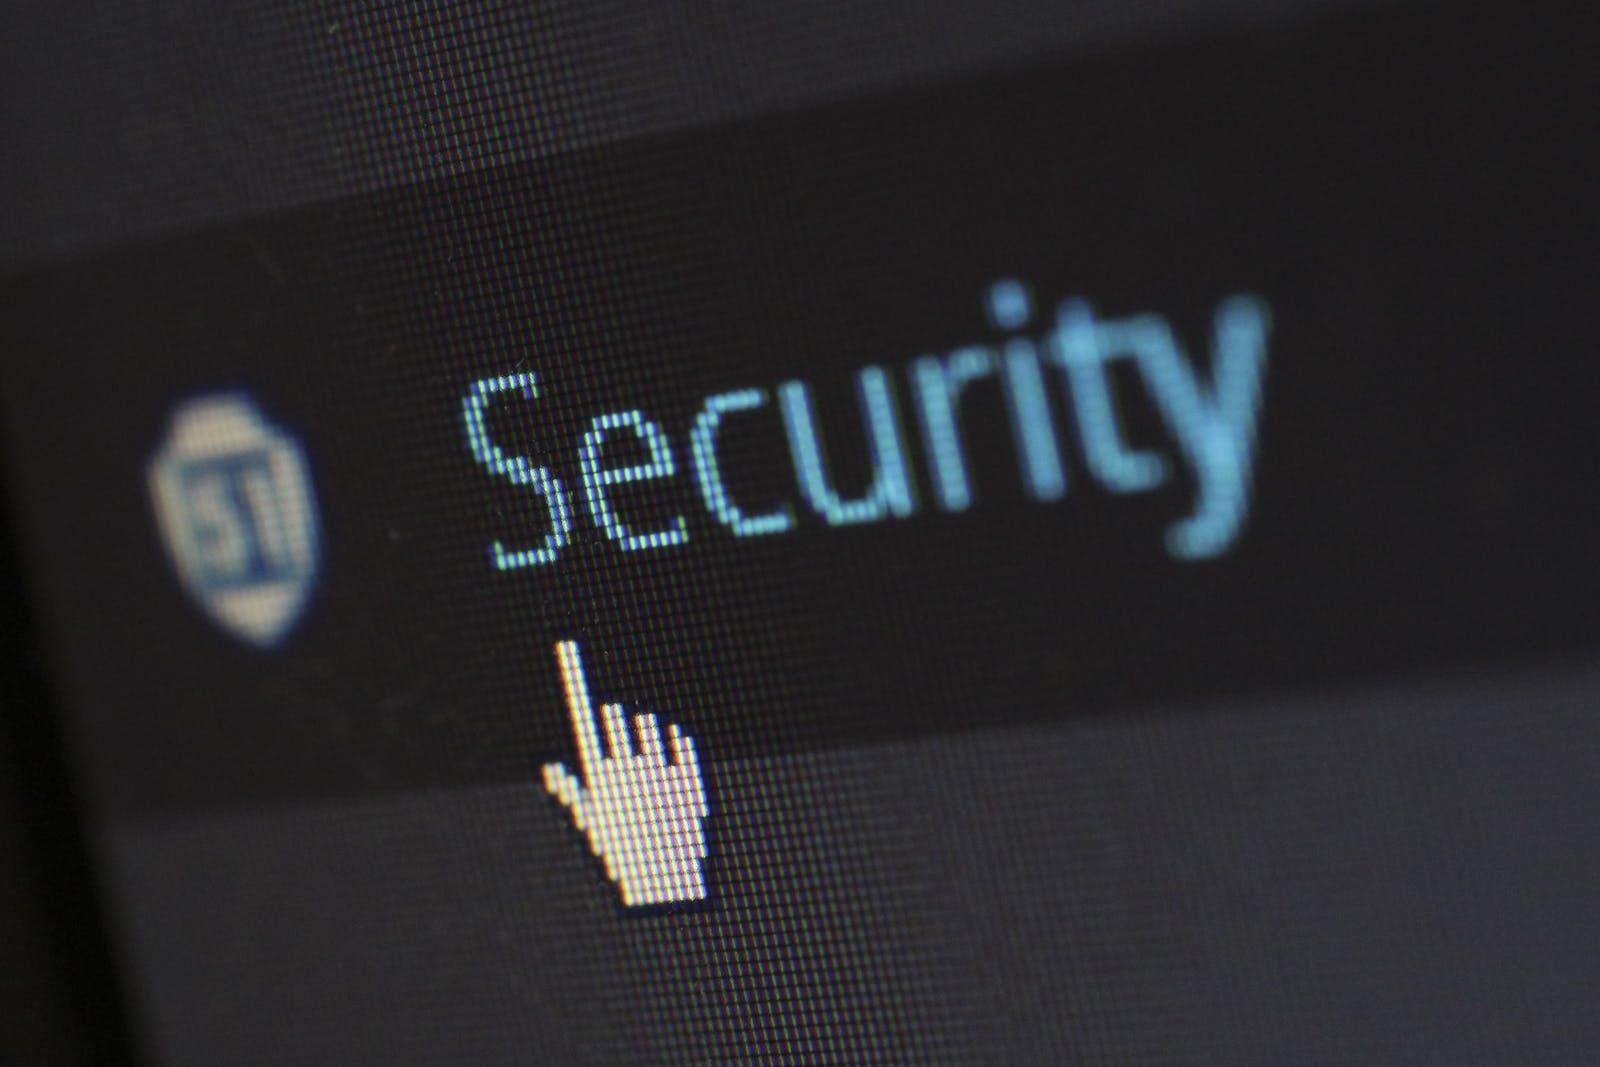 126025_security-protection-anti-virus-software-60504.jpeg